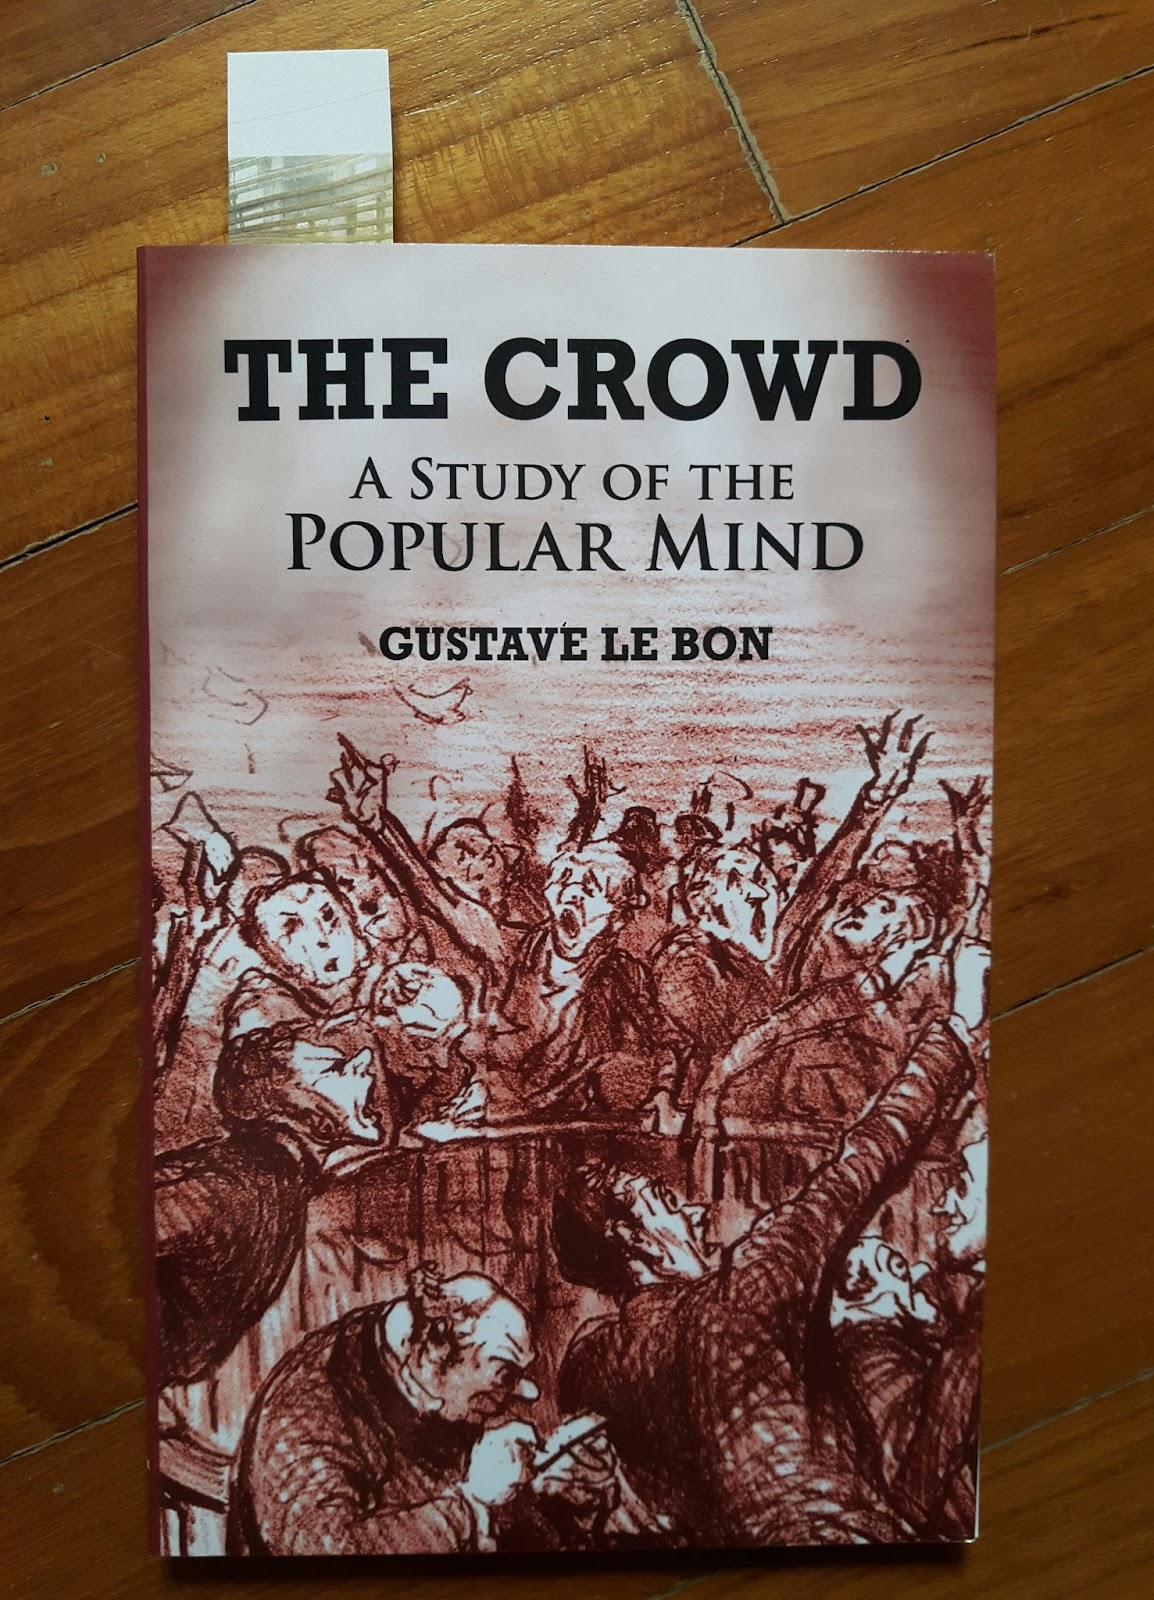 le bon crowd psychology